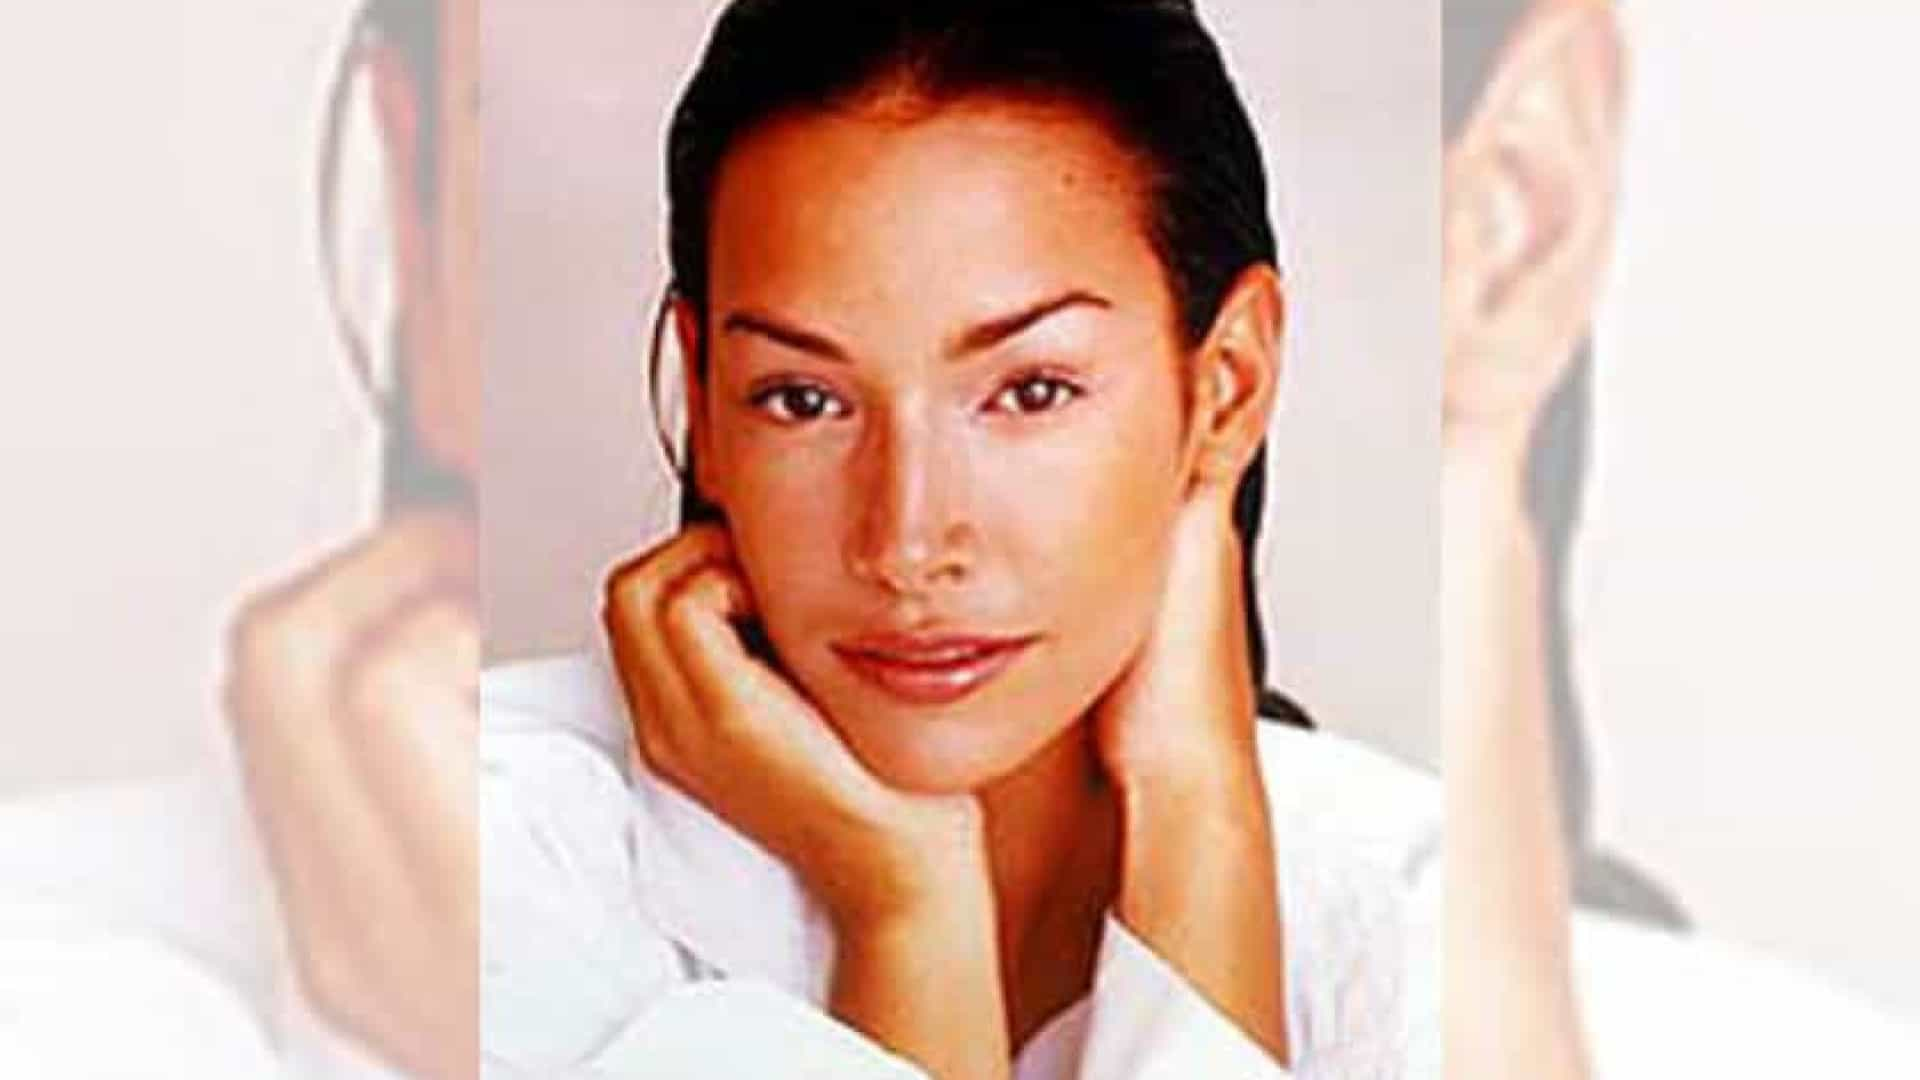 27 de julho: morte da modelo Fernanda Vogel chocou o Brasil